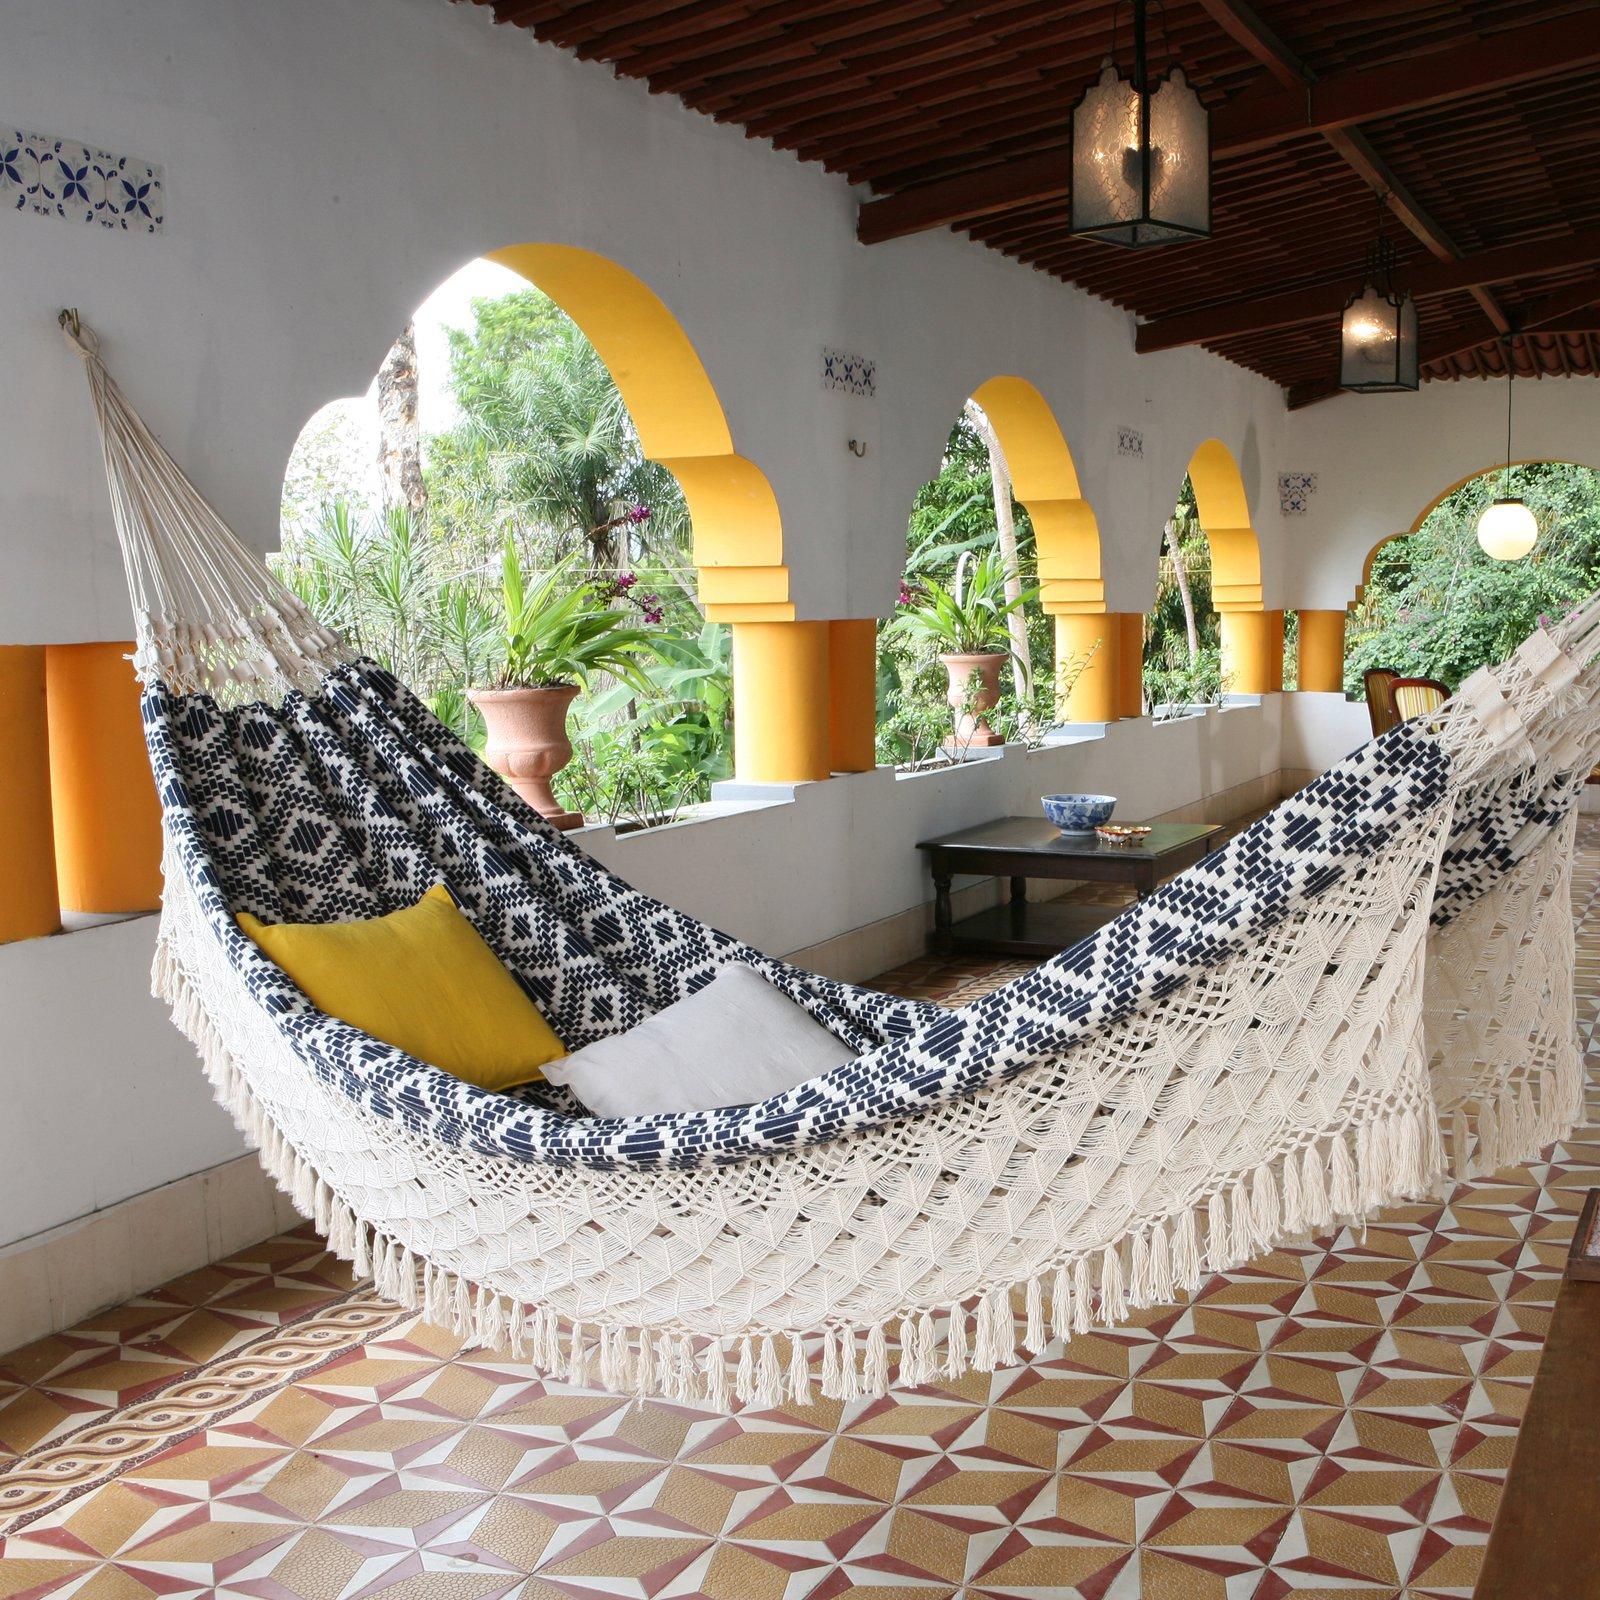 Monochrome-bohemian-hammock-